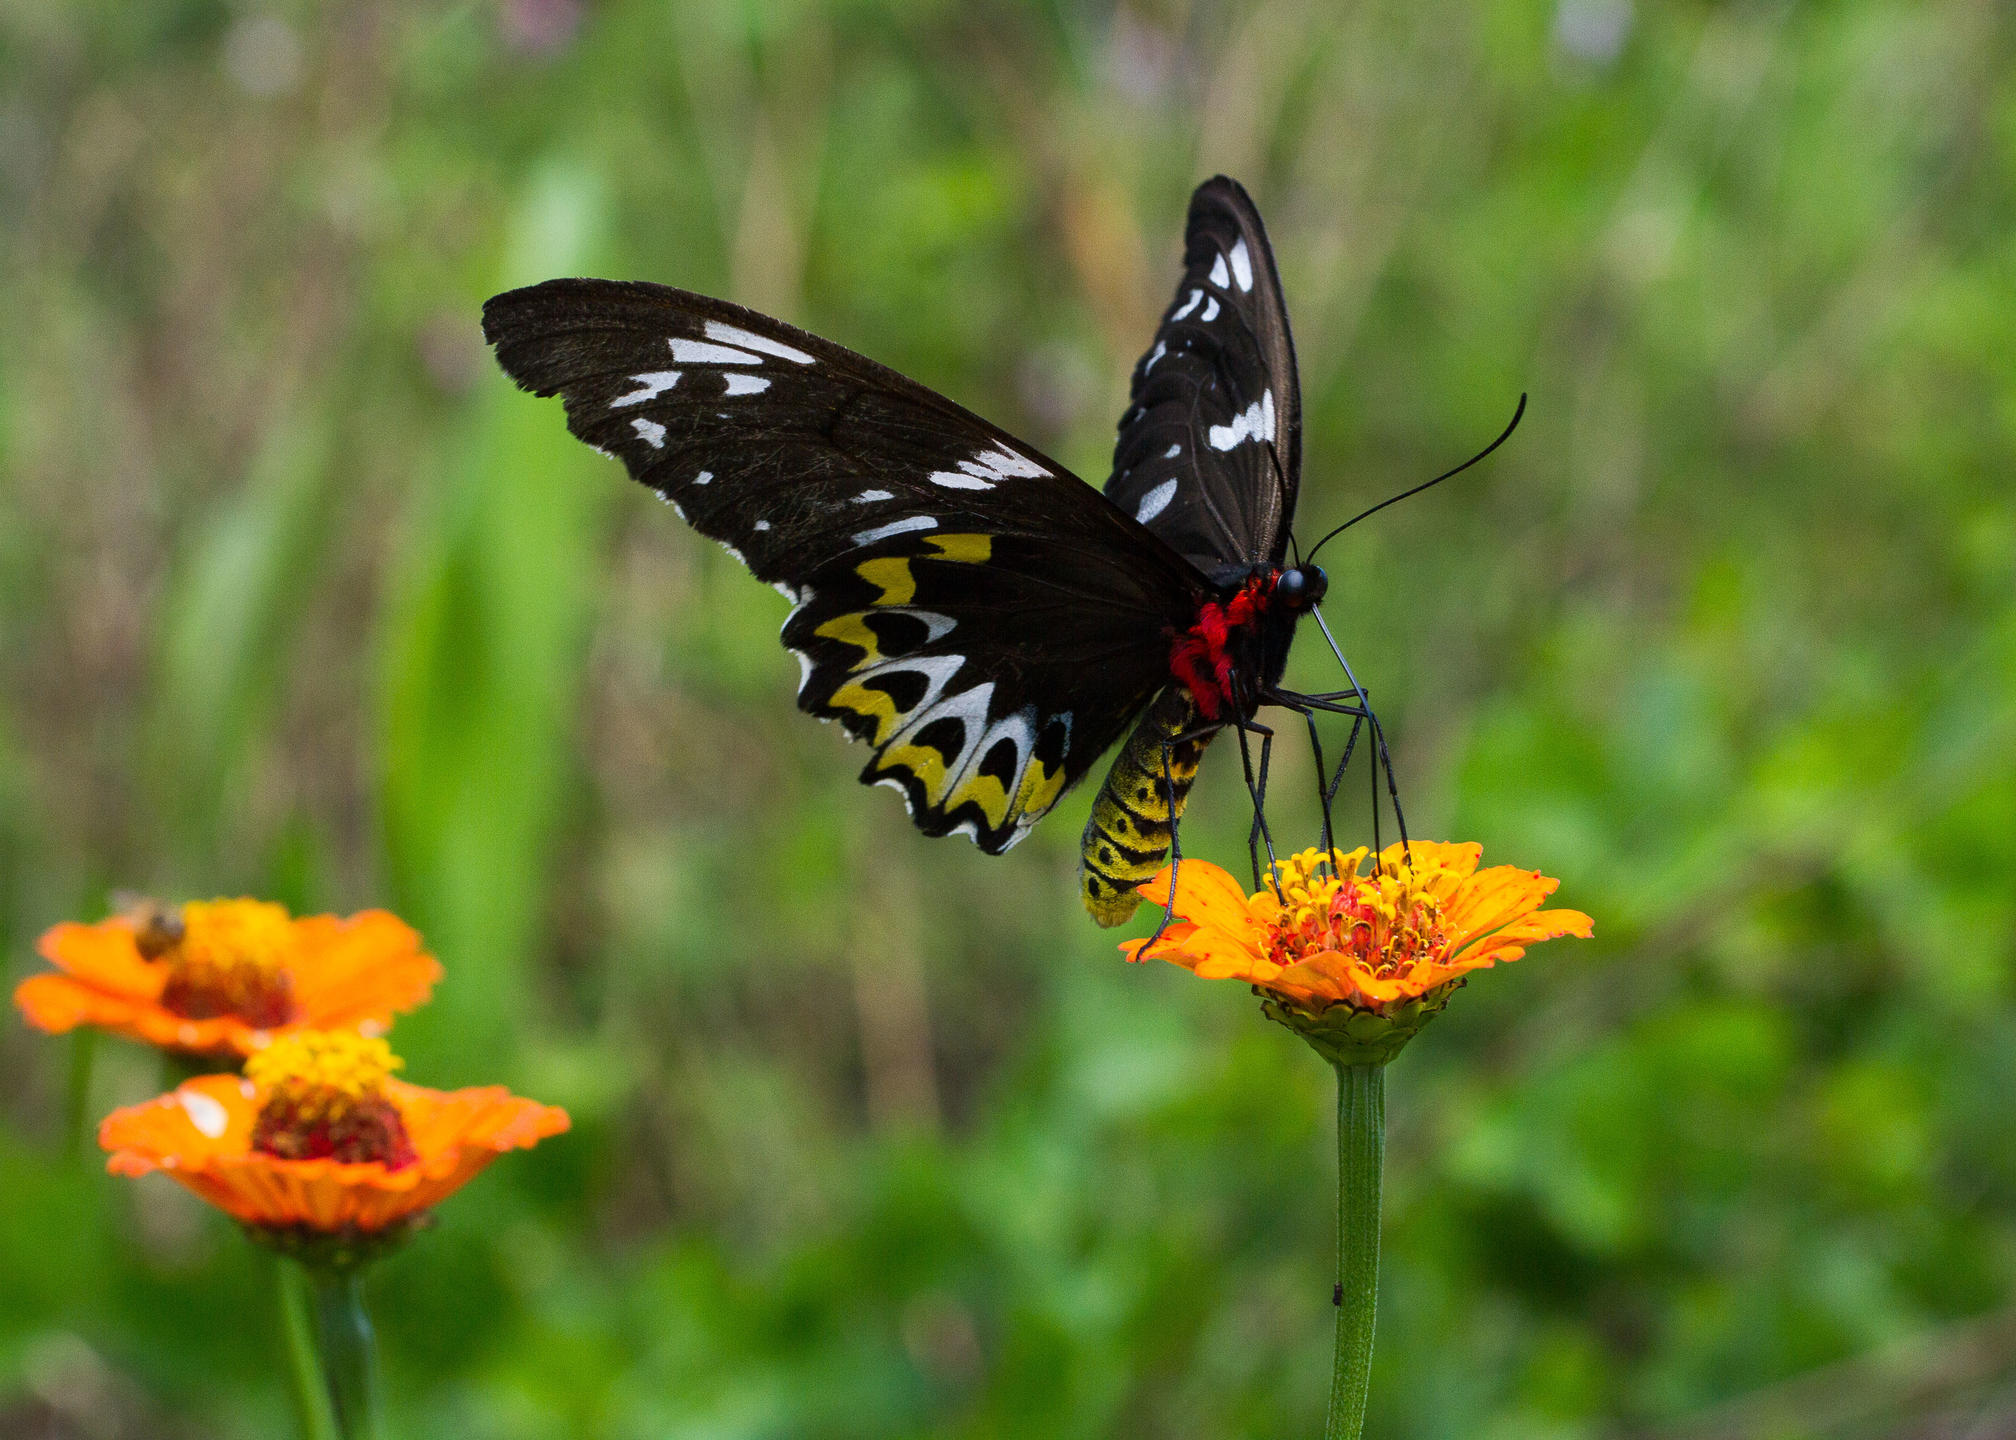 A birding butterfly resting on a flower